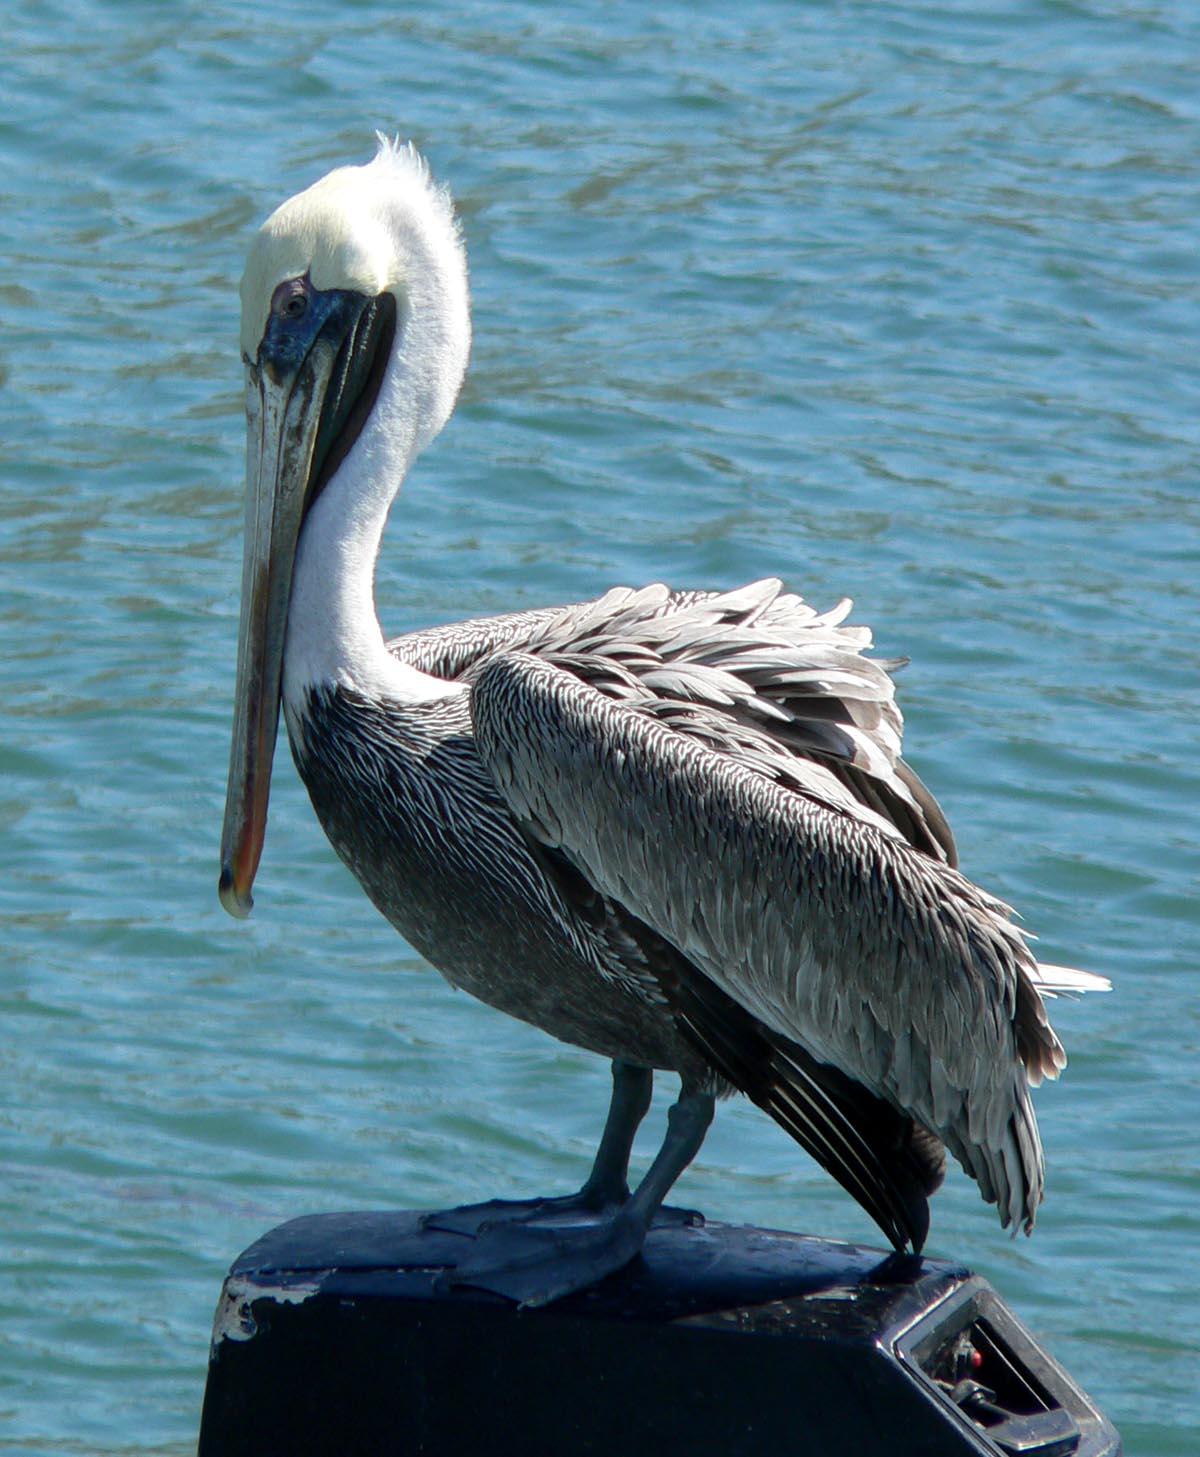 Pelik notvar wikip dia - Fotos de pelicanos ...